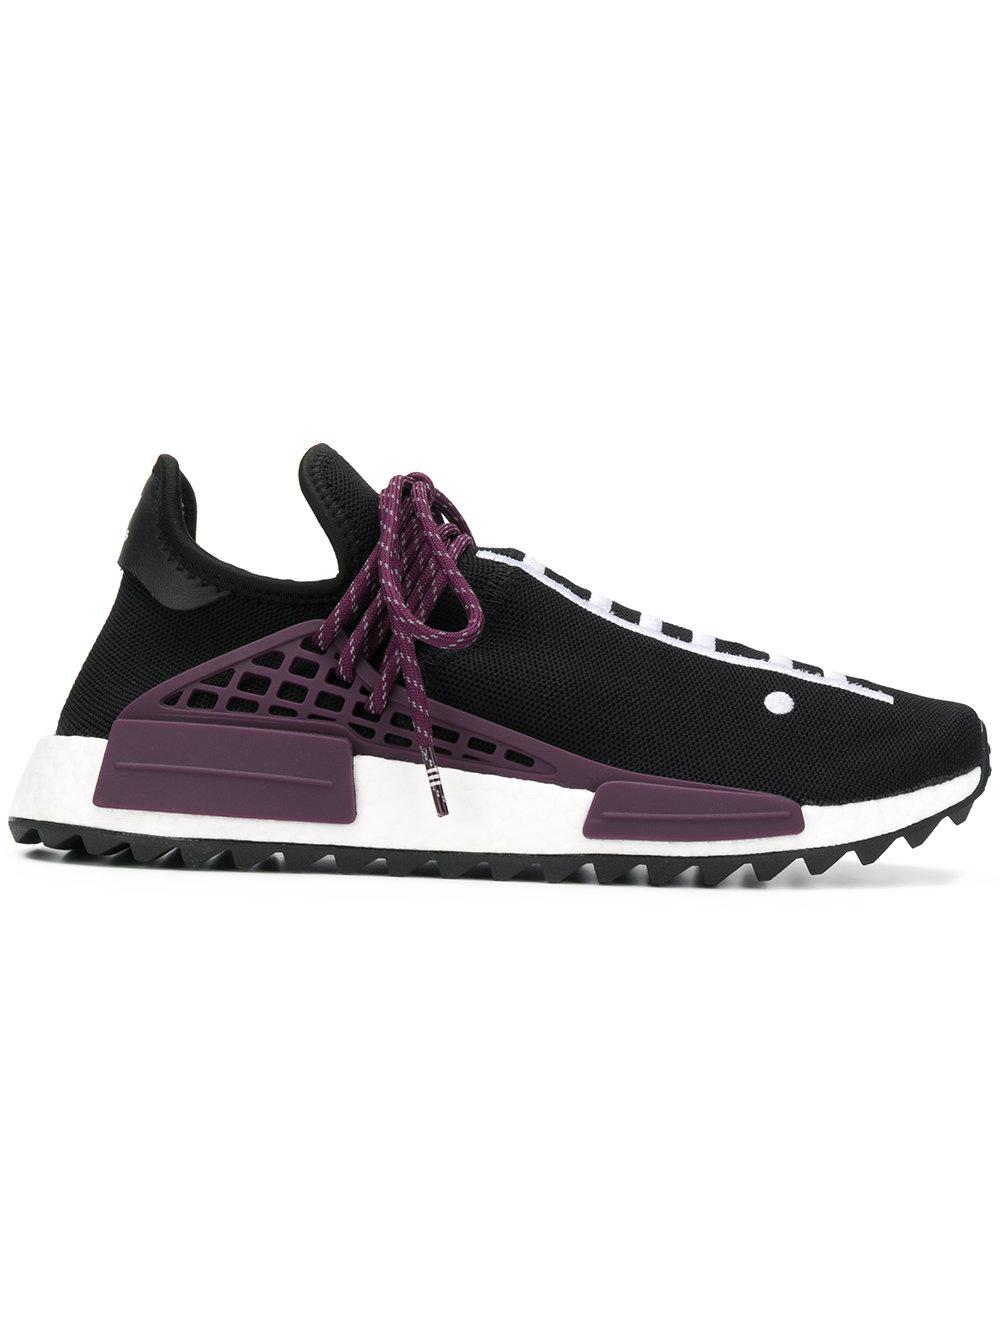 size 40 9ff09 973cf Adidas By Pharrell Williams Hu Holi Nmd Sneakers - Black